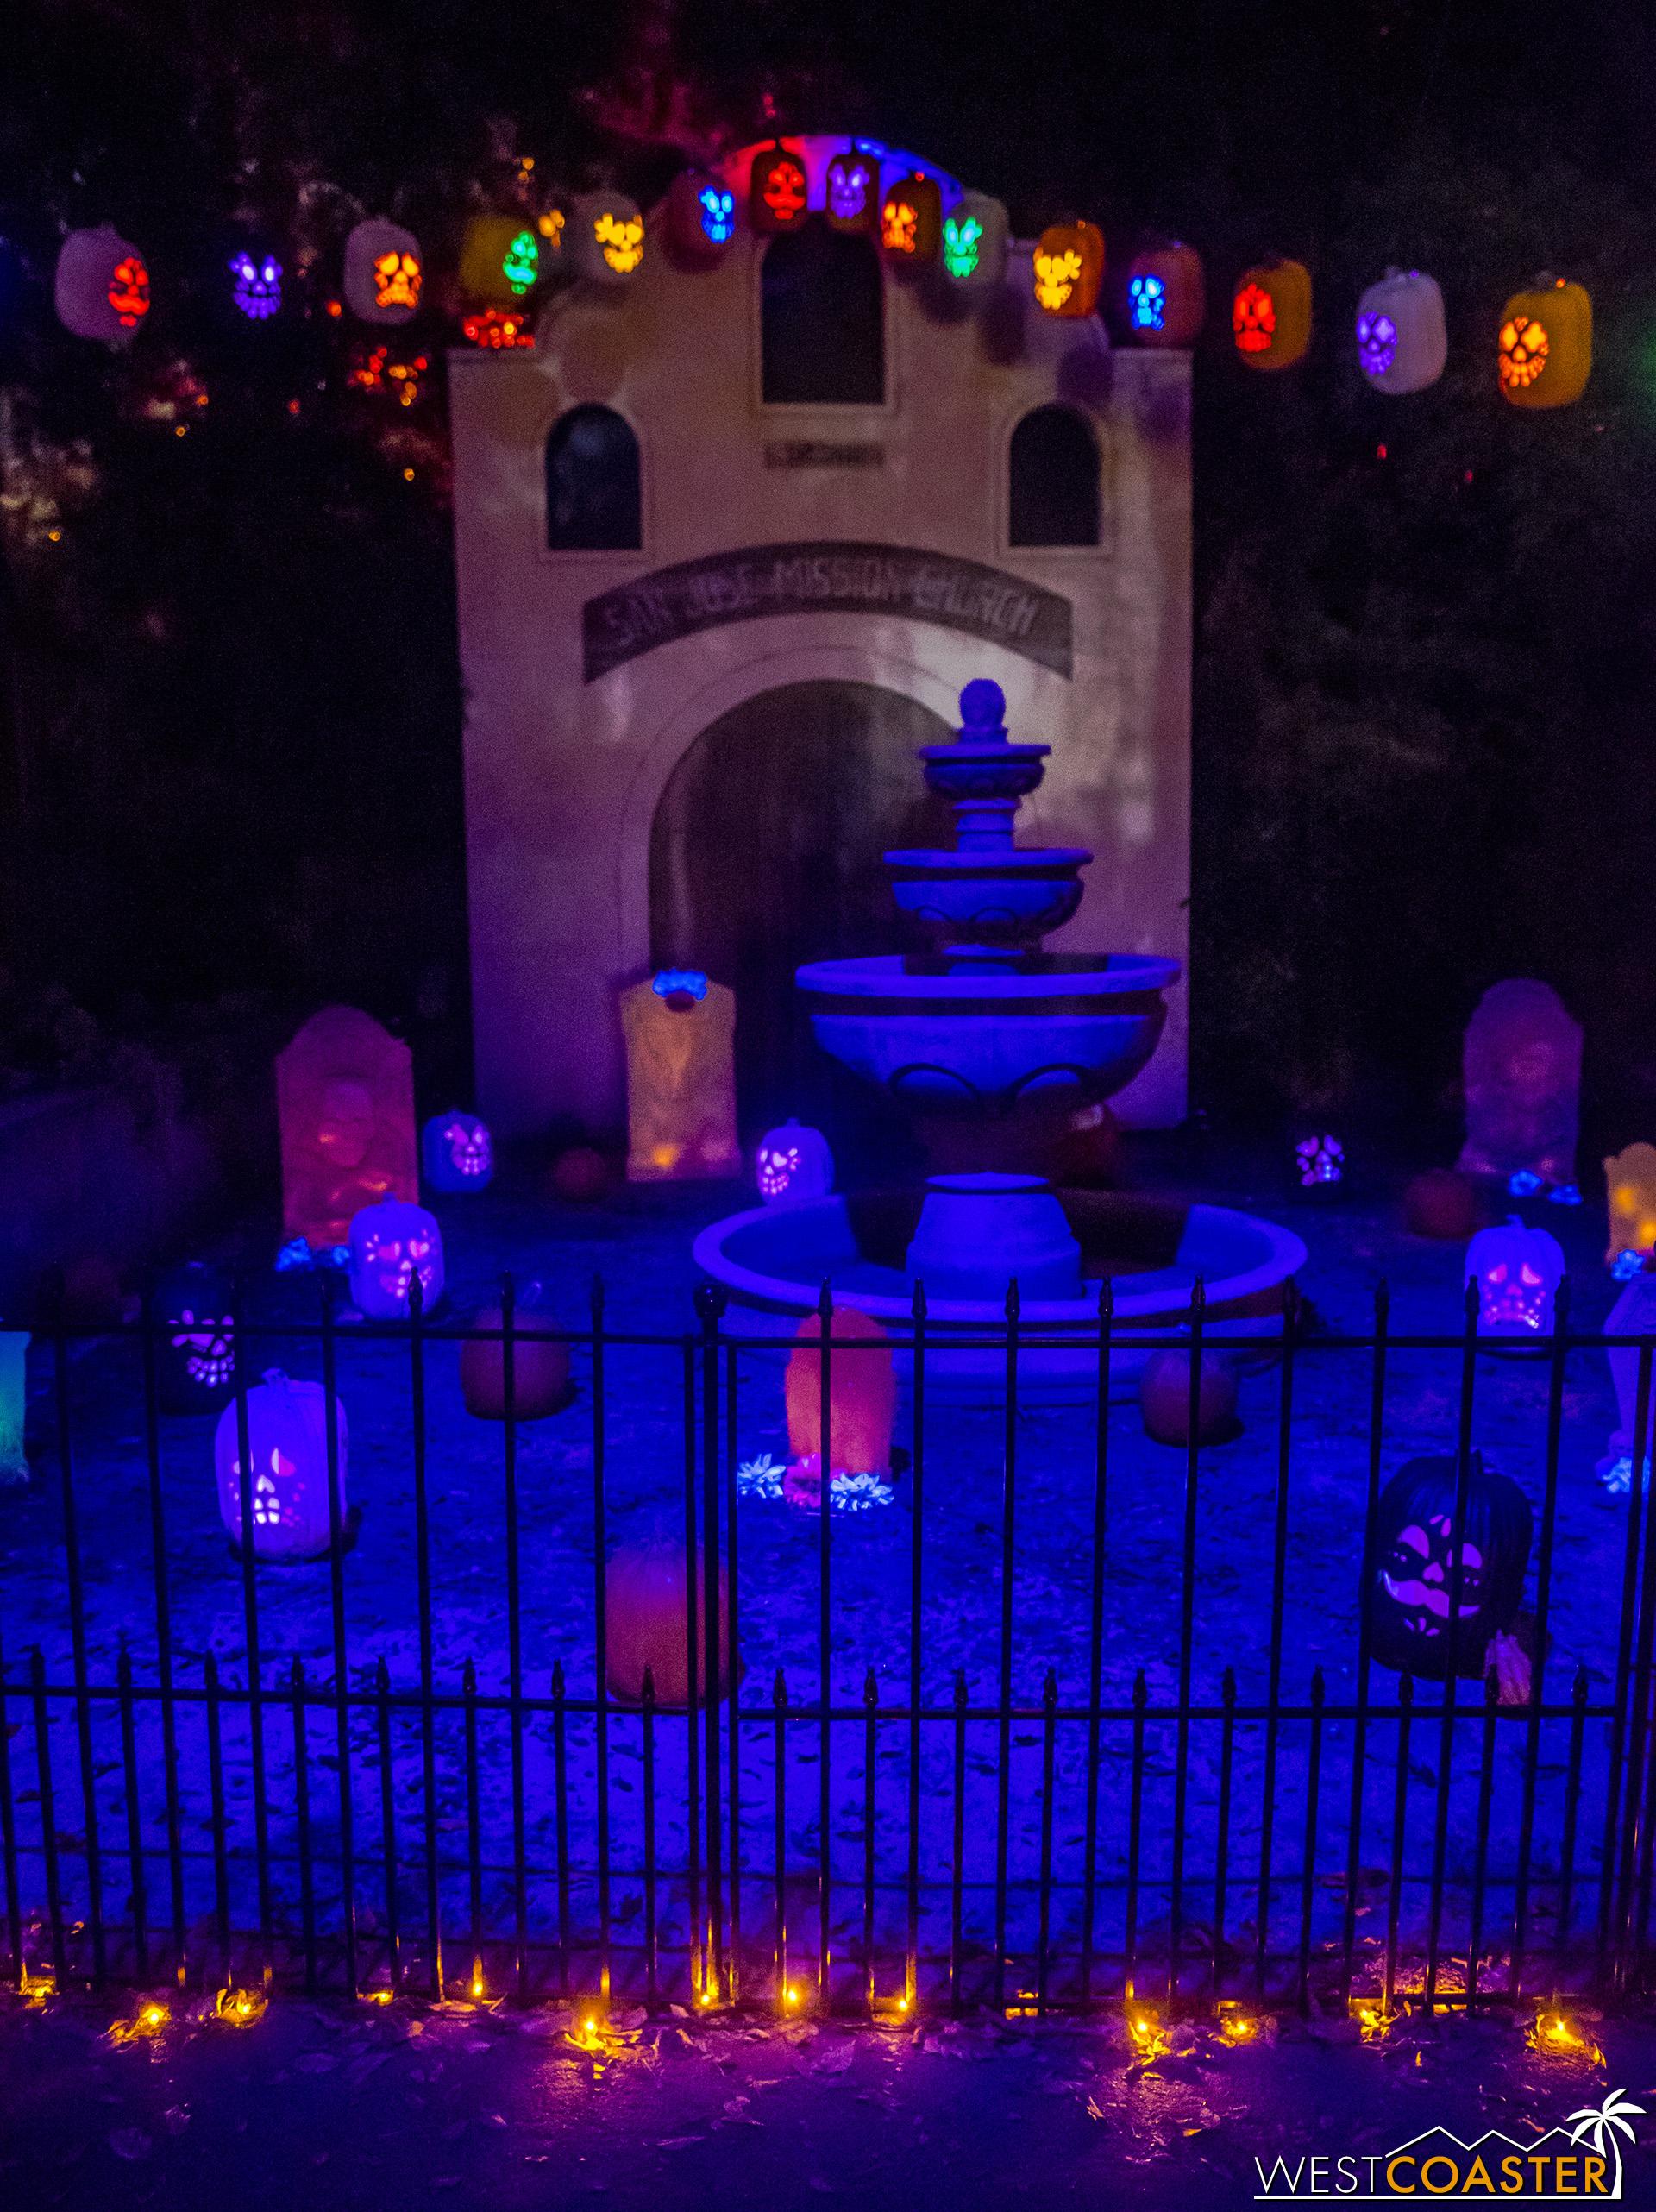 Maravilla Lane provided a fanciful environment celebrating Día de los Muertos.